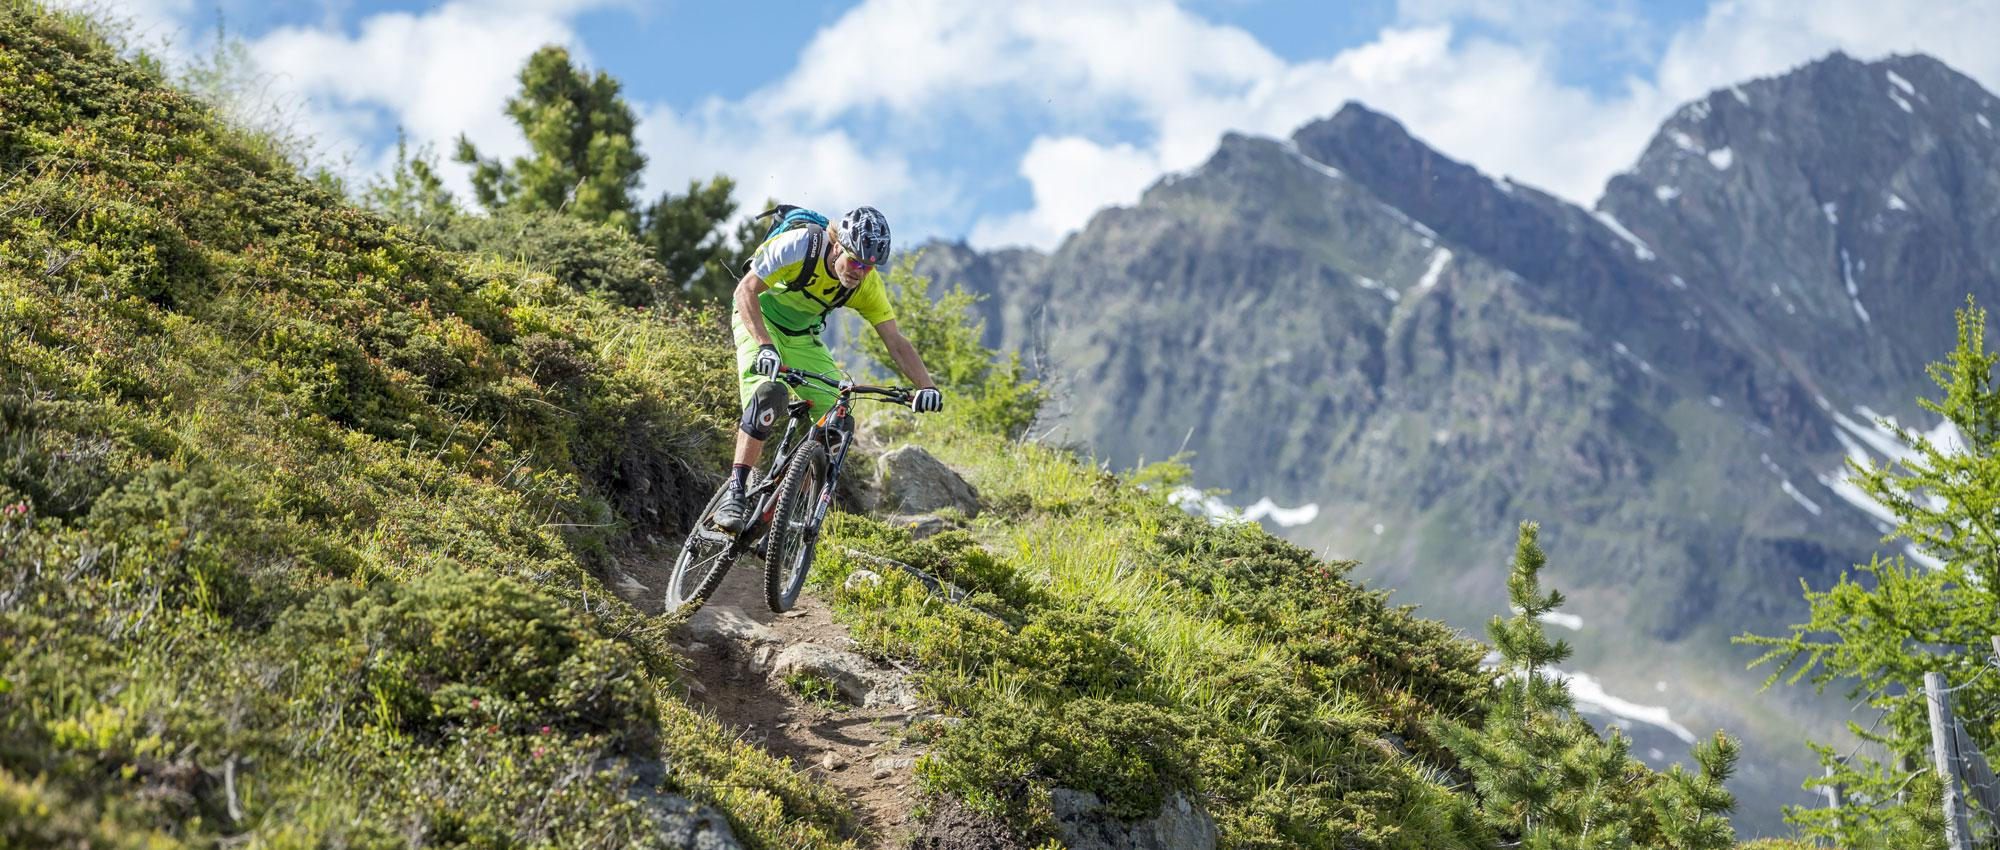 Biker rasant downhill.jpg